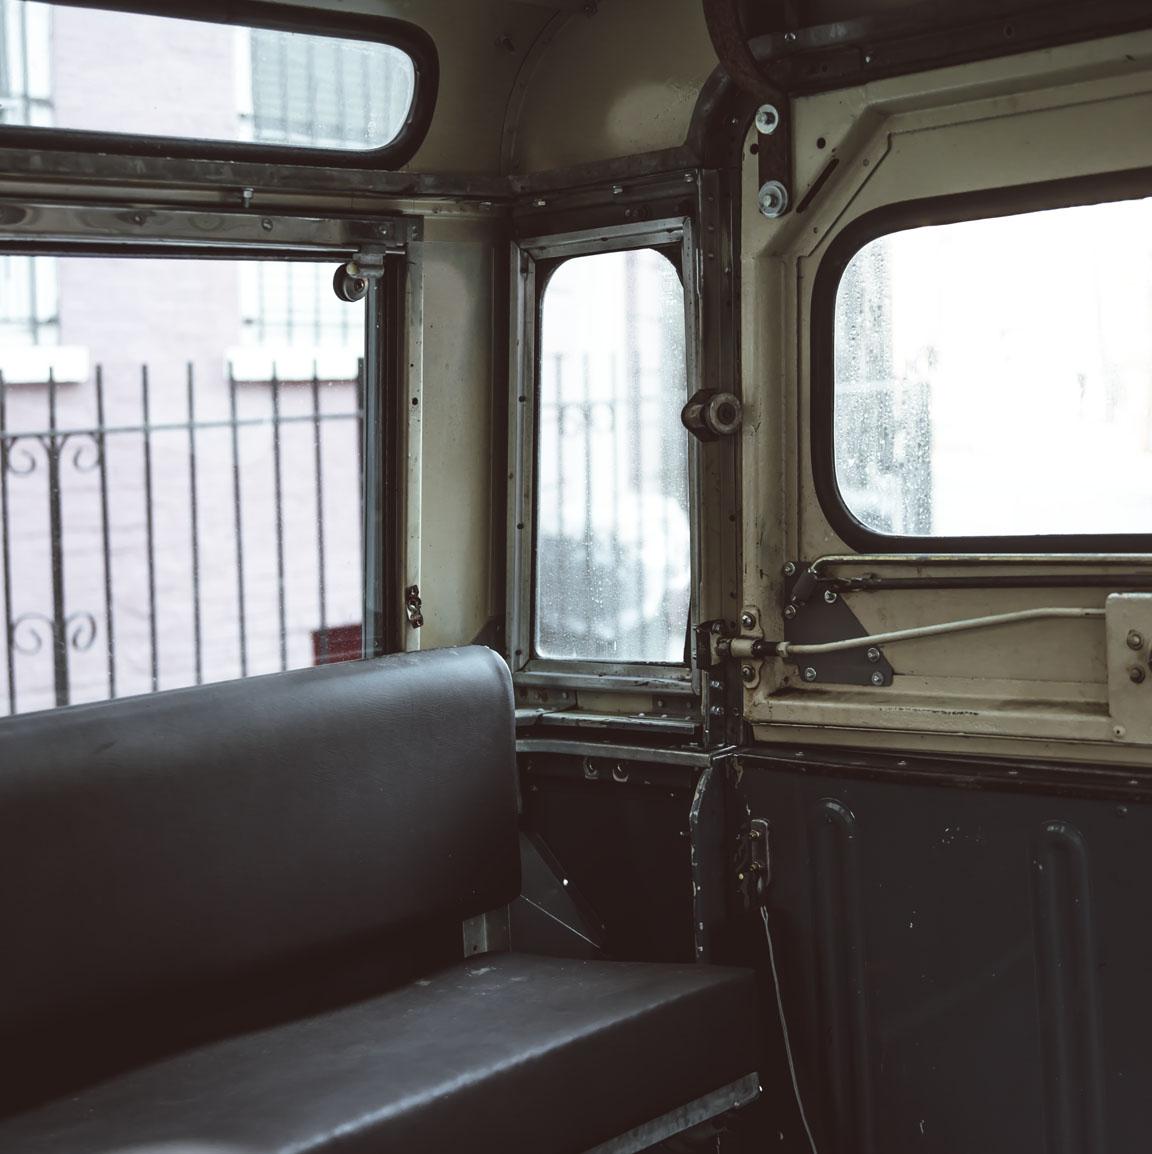 small_1972_Land_Rover_Series_III_0015_Layer 60.jpg